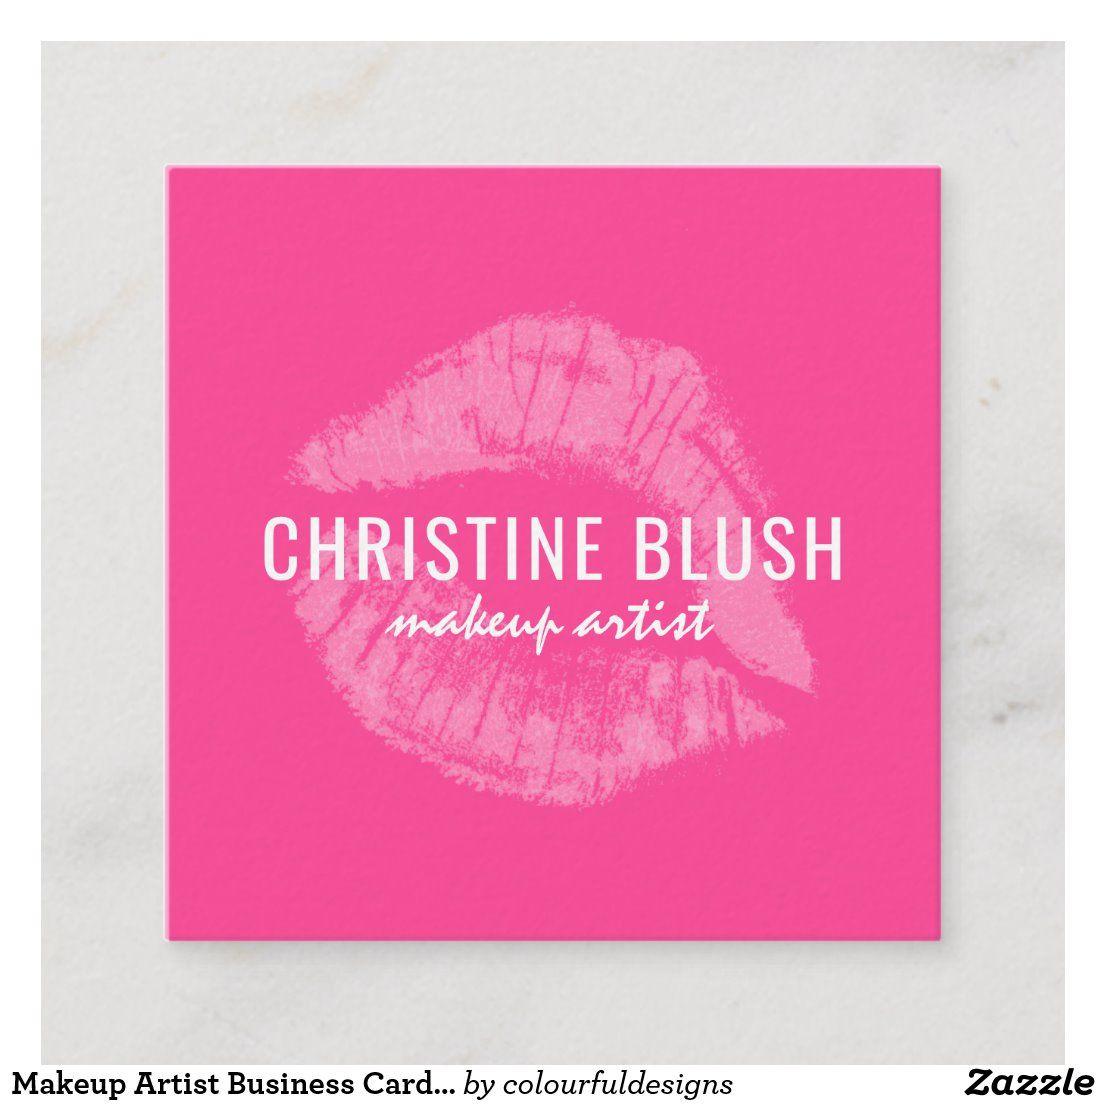 Makeup Artist Business Card Template Zazzle Com Makeup Artist Business Cards Makeup Artist Business Cards Templates Makeup Artist Business